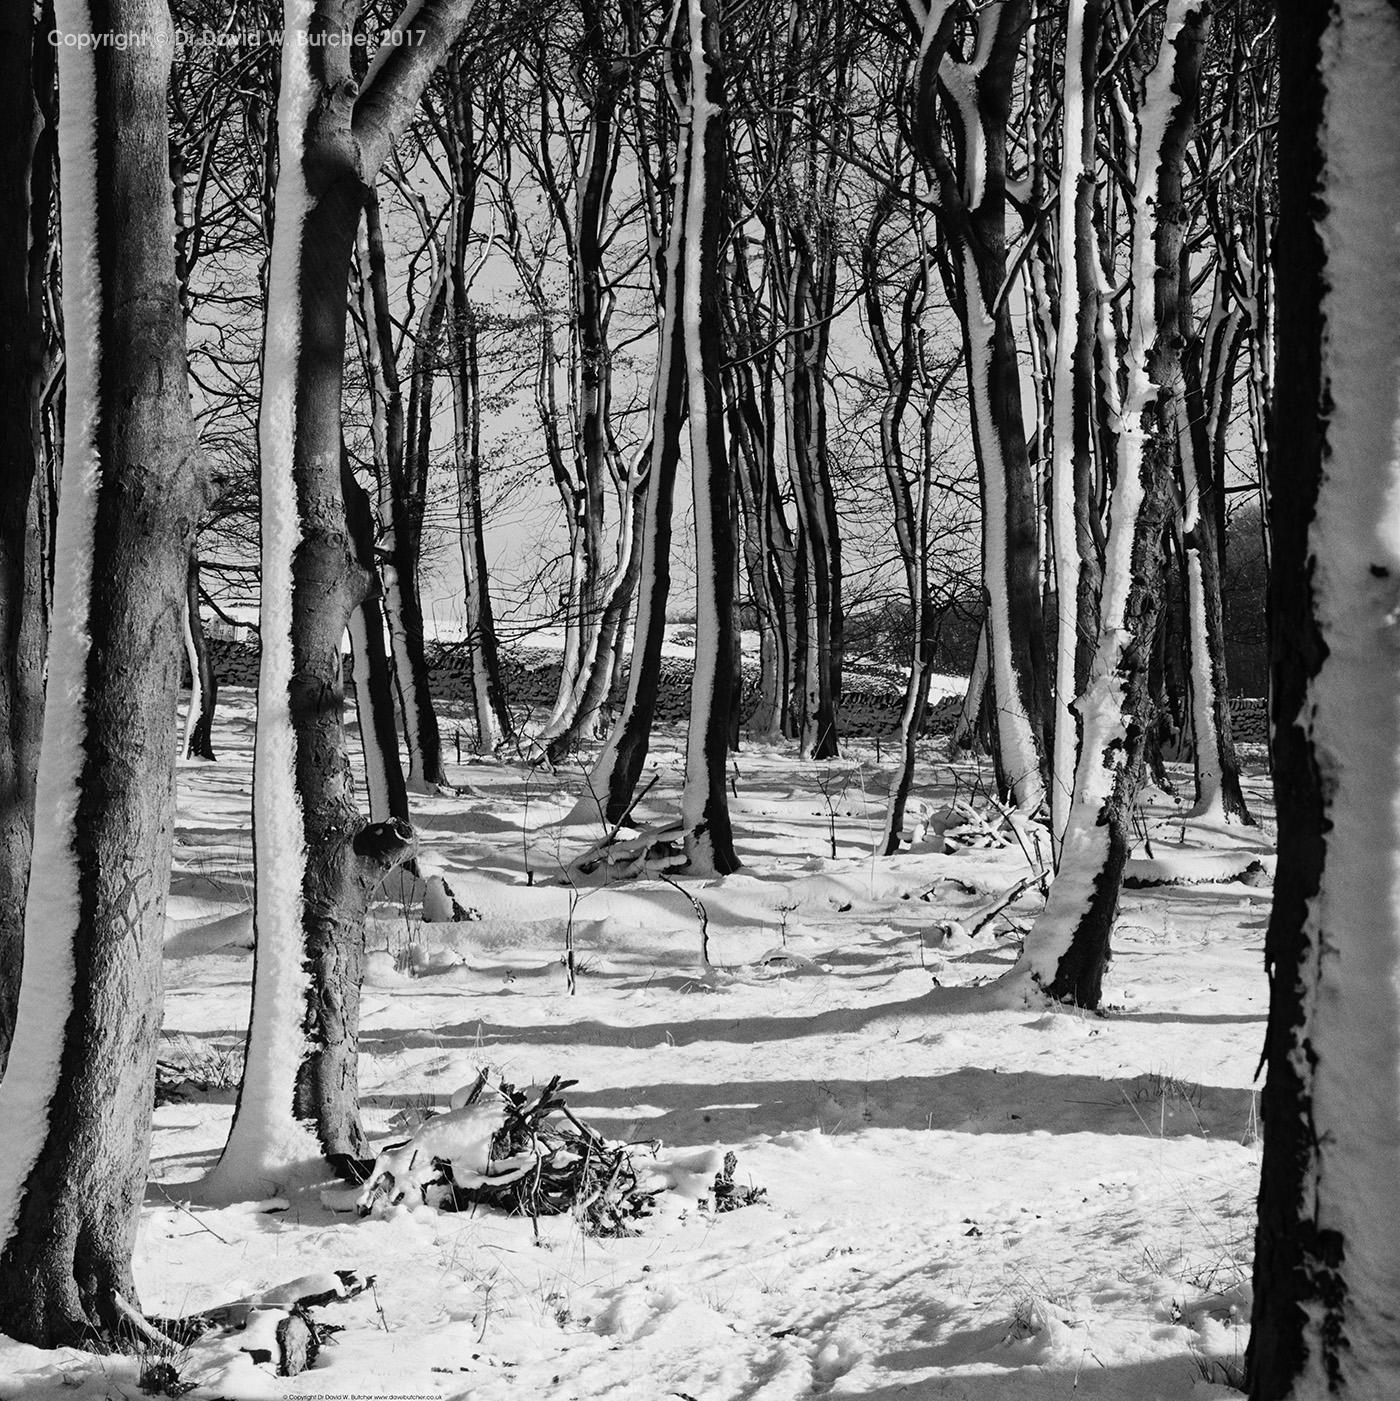 Buxton Snowy Trees, Peak District